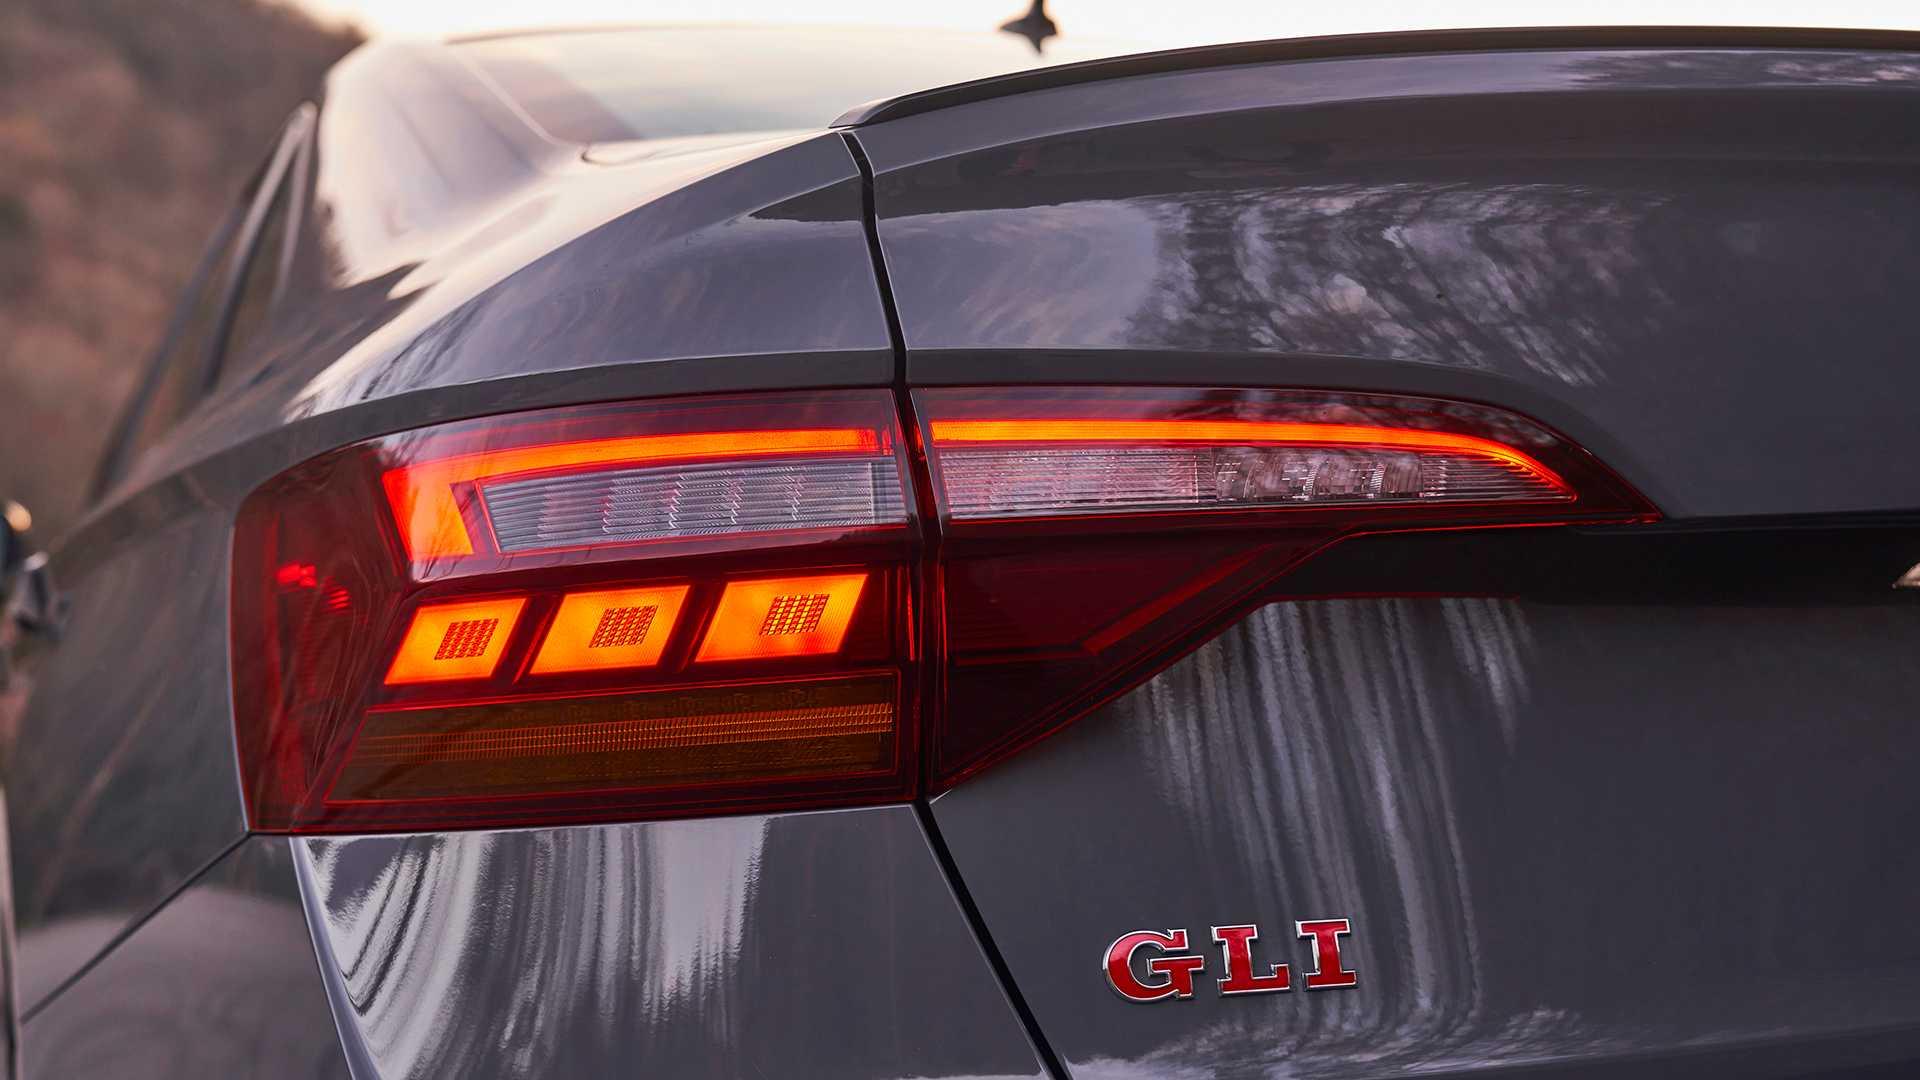 2019 Volkswagen Jetta GLI badge